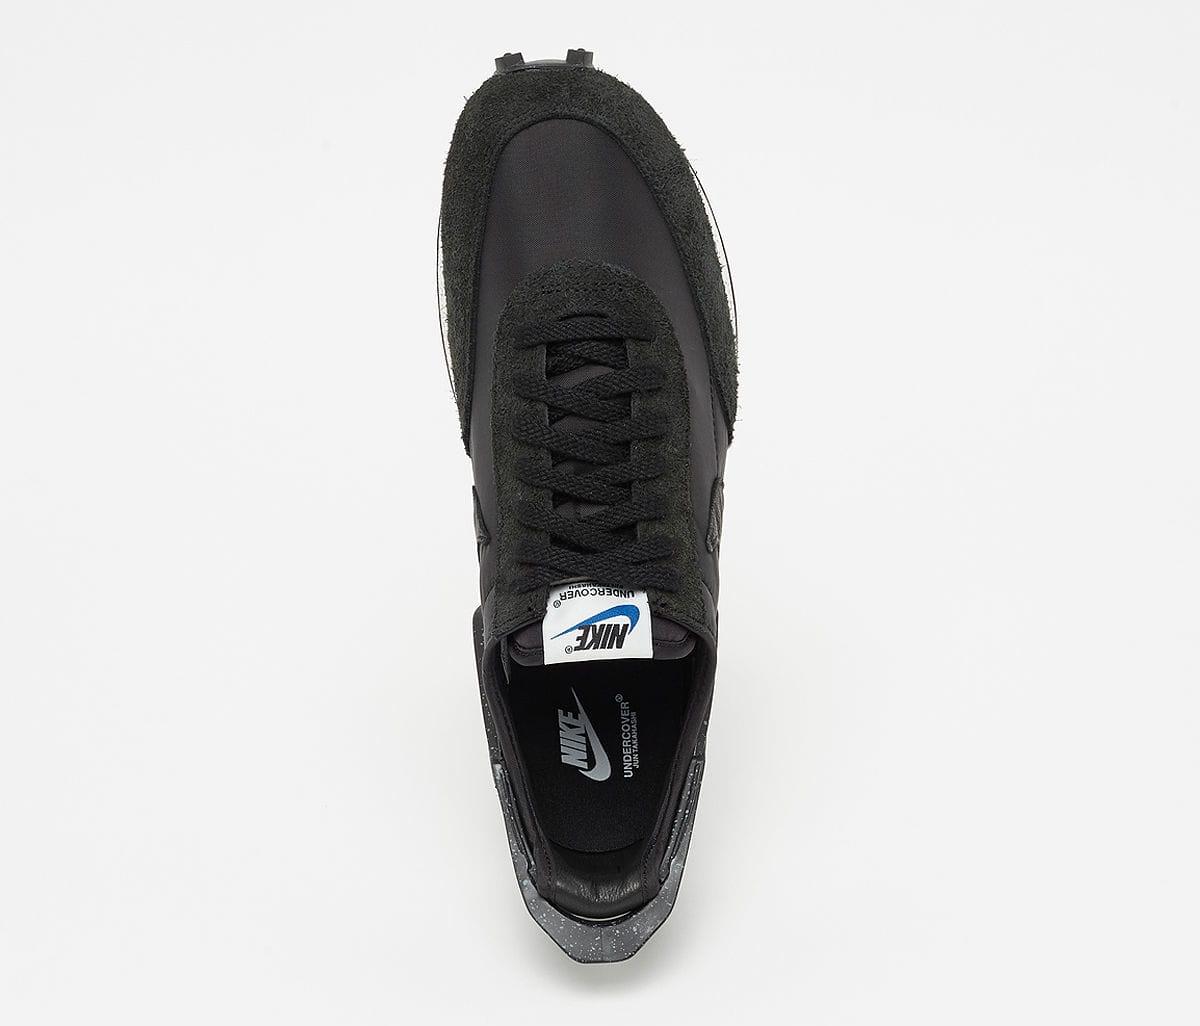 Undercover x Nike Daybreak CJ3295-001 (Top)